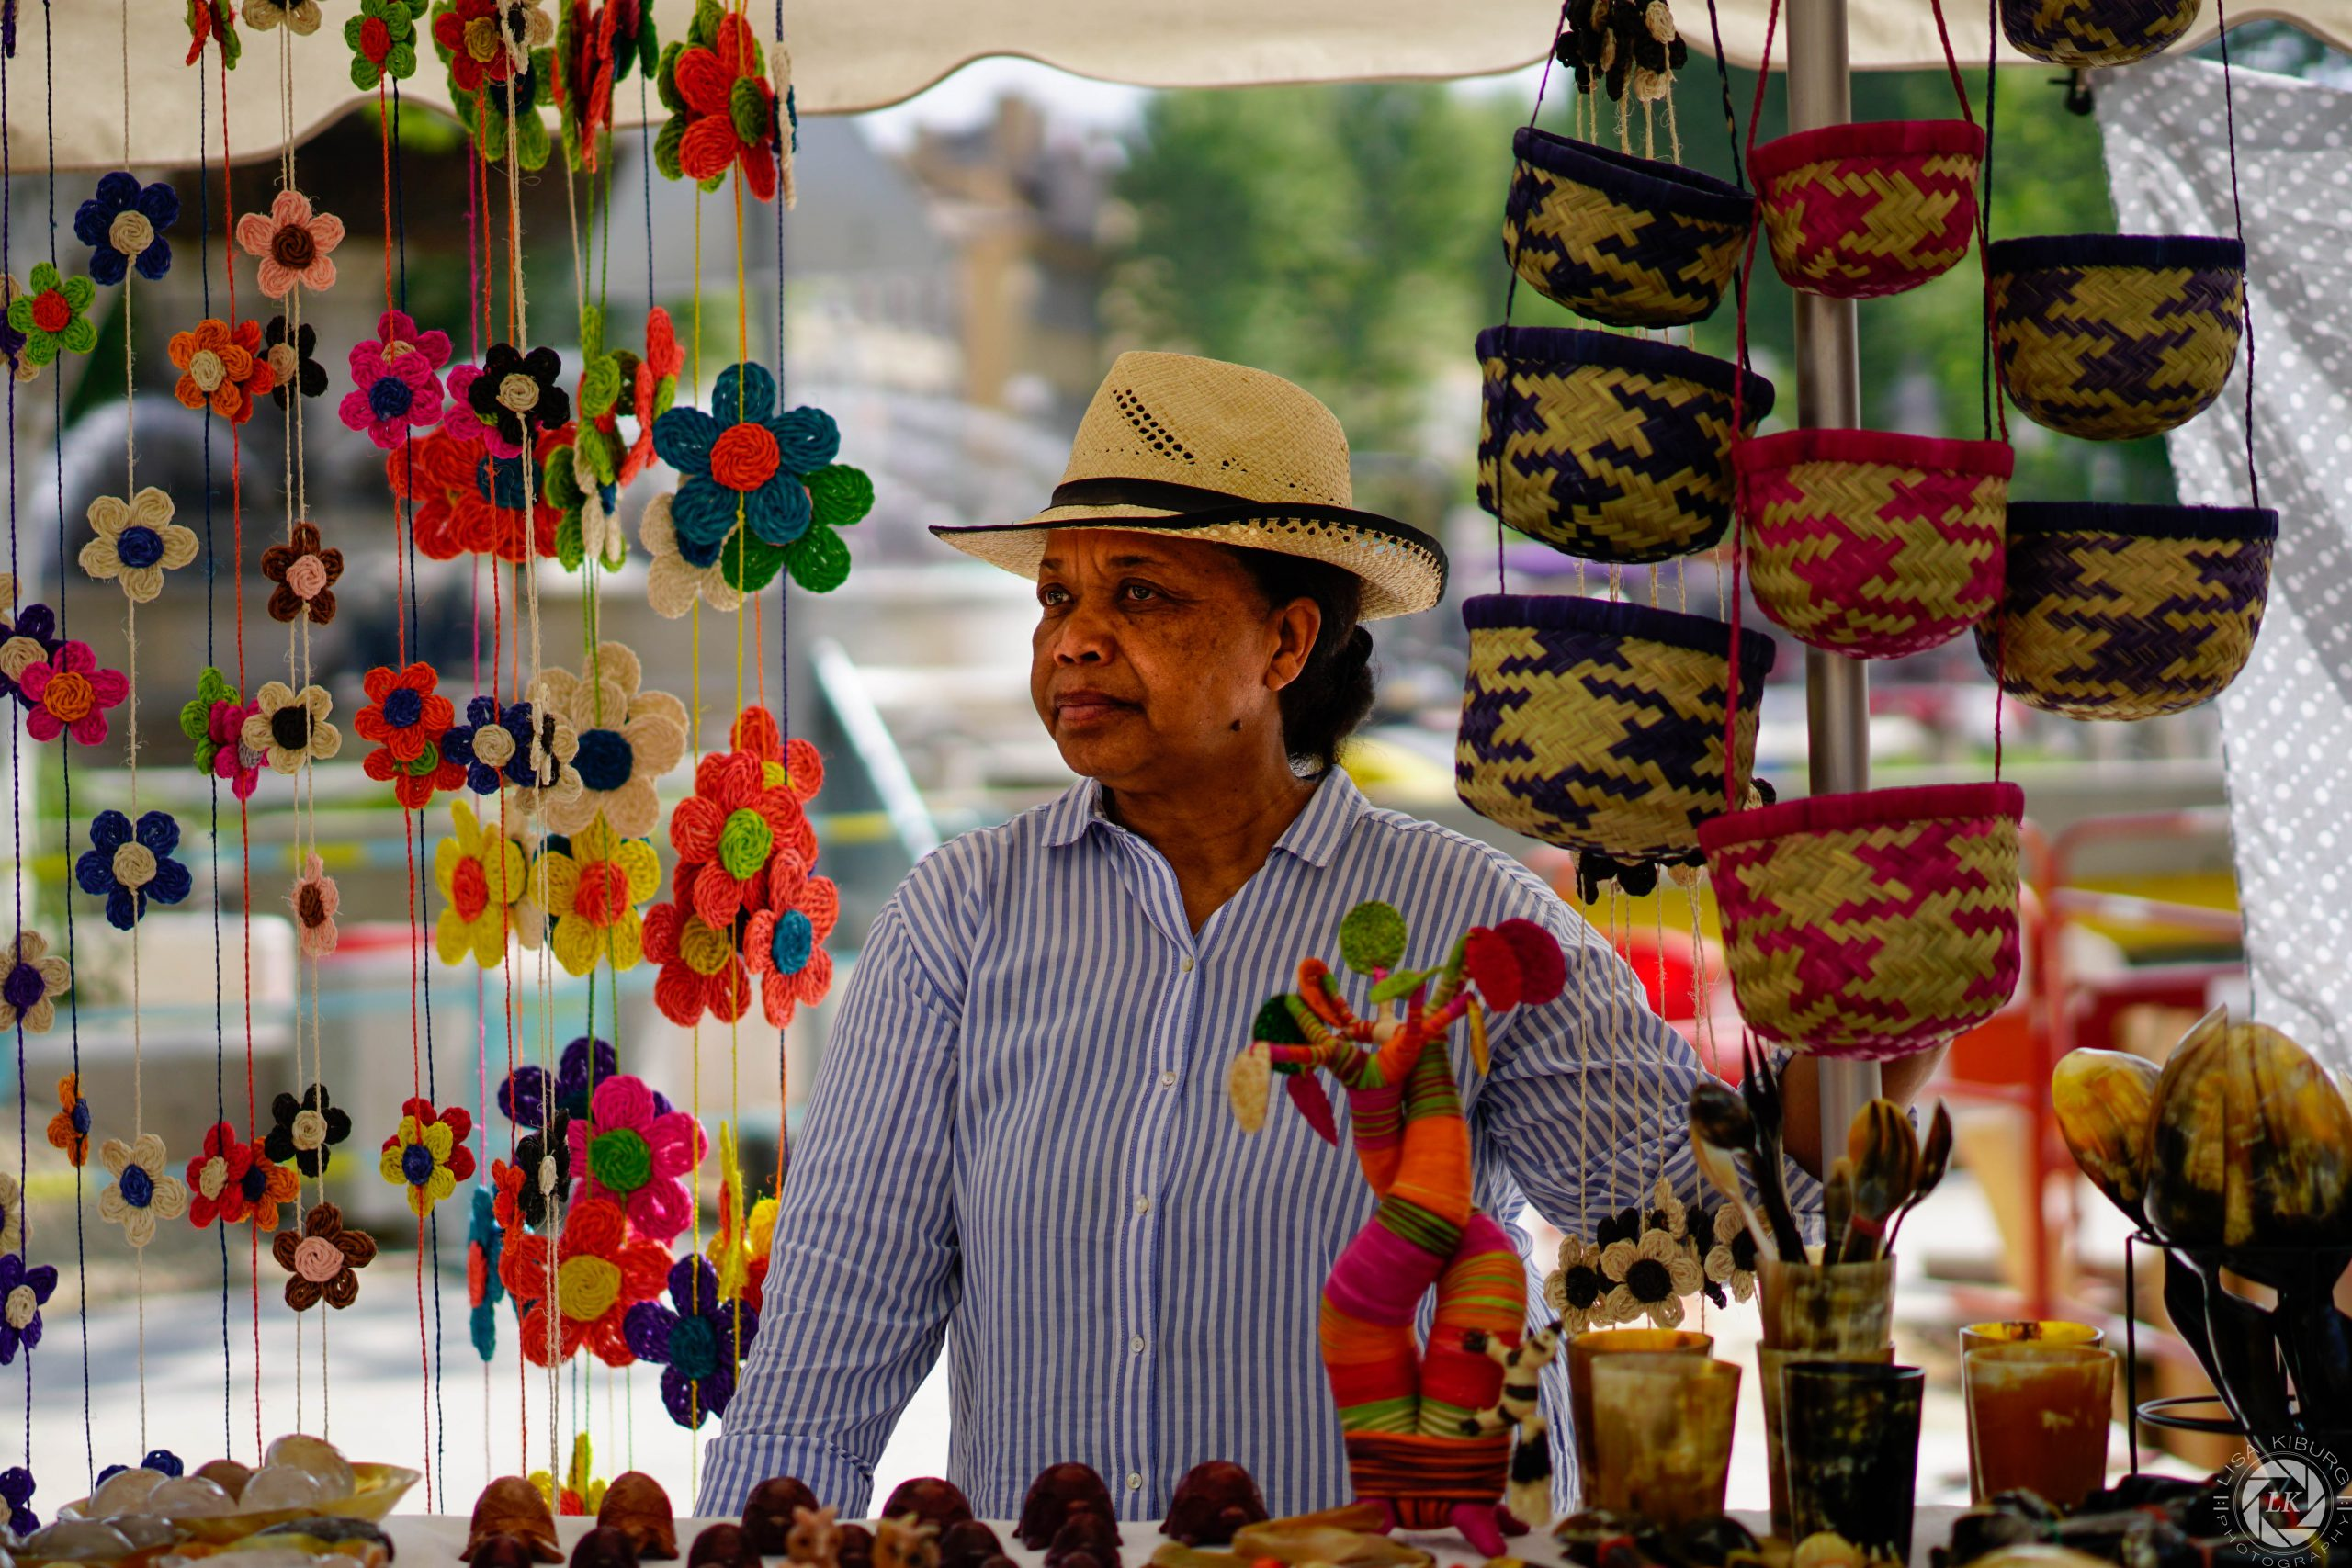 French marketlife